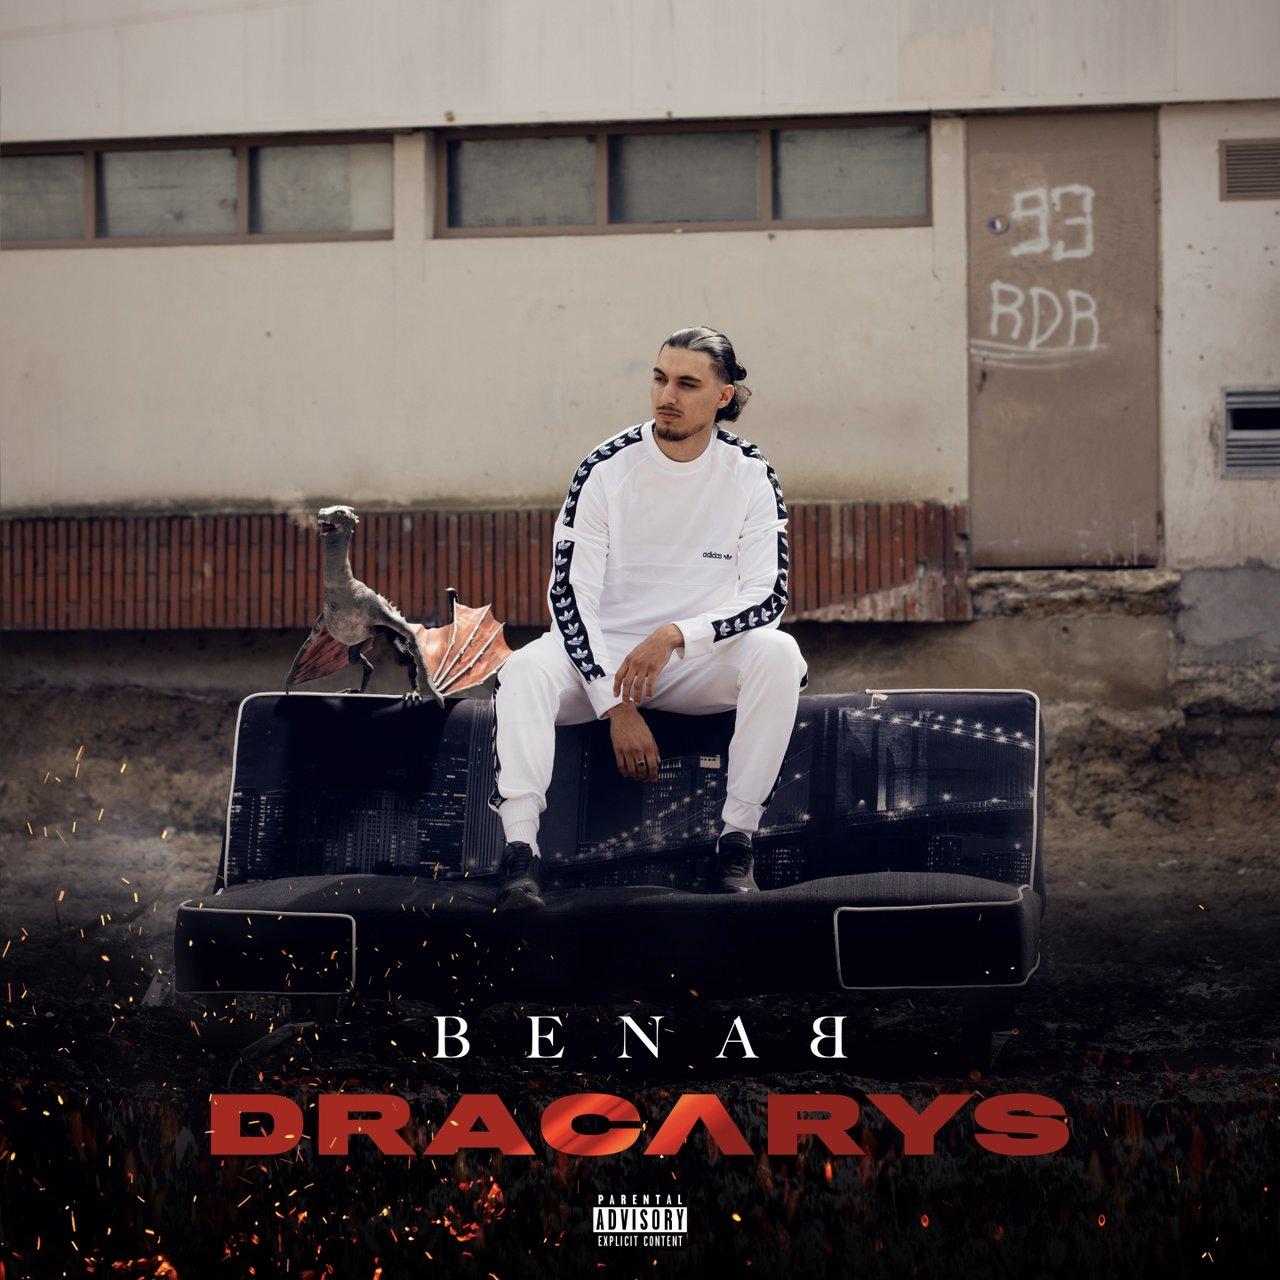 Benab - Dracarys